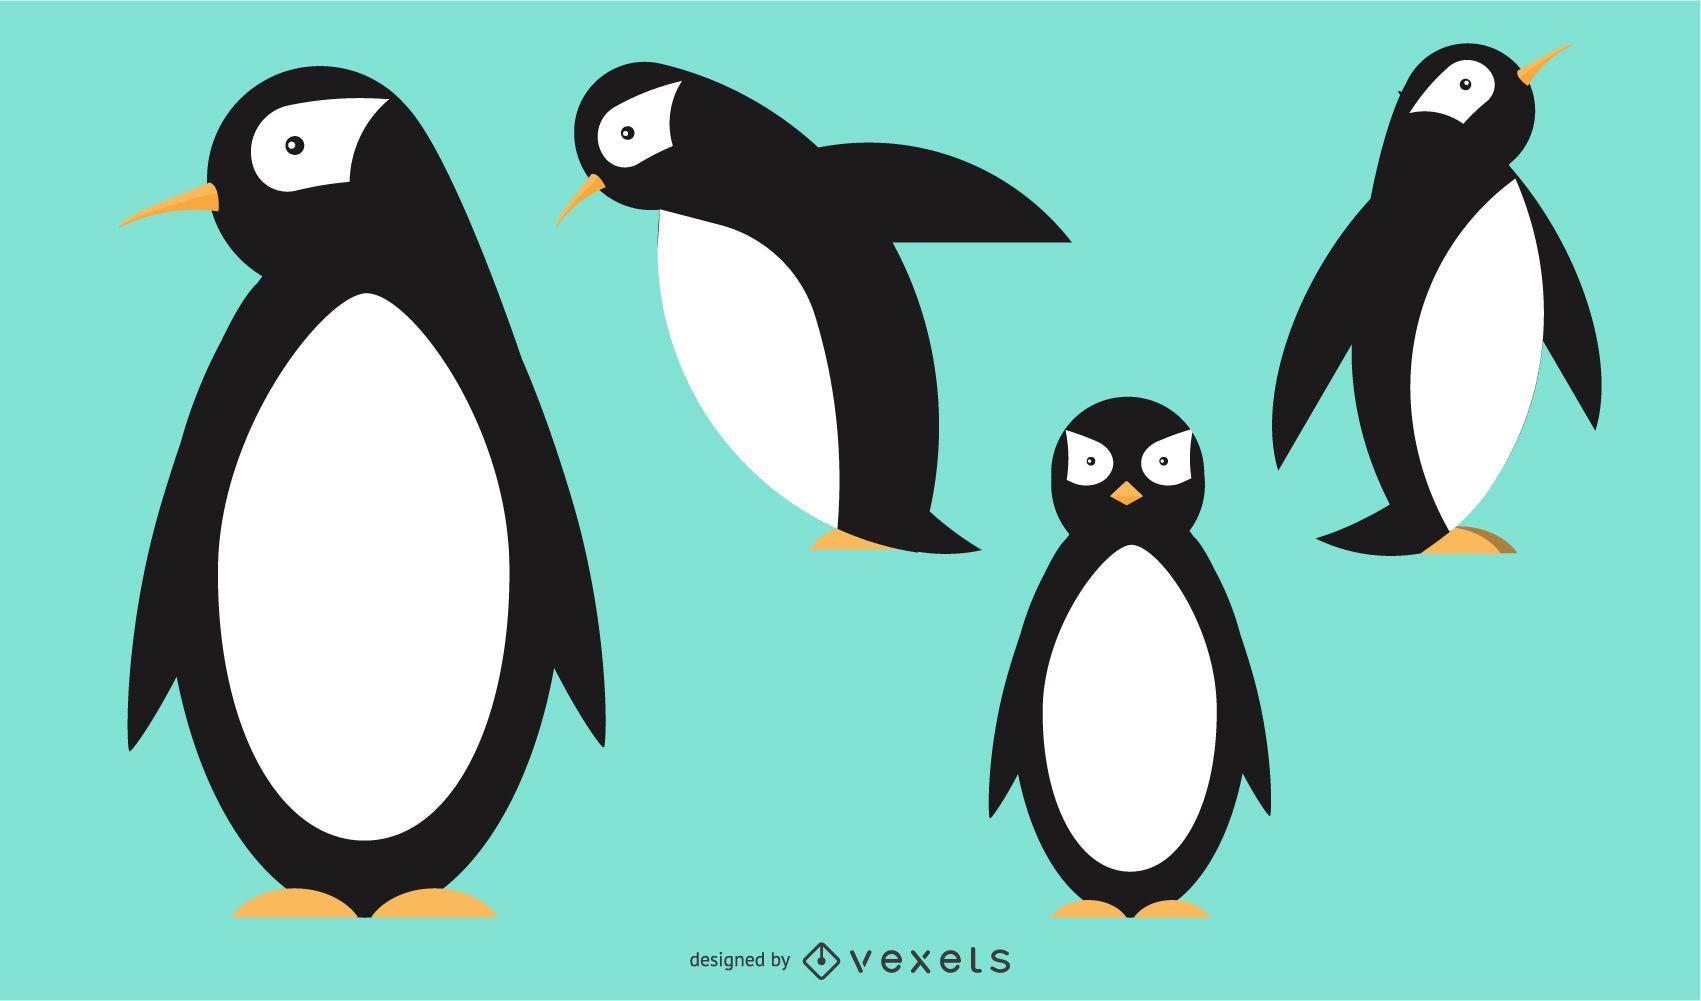 Penguin Rounded Geometric Vector Design